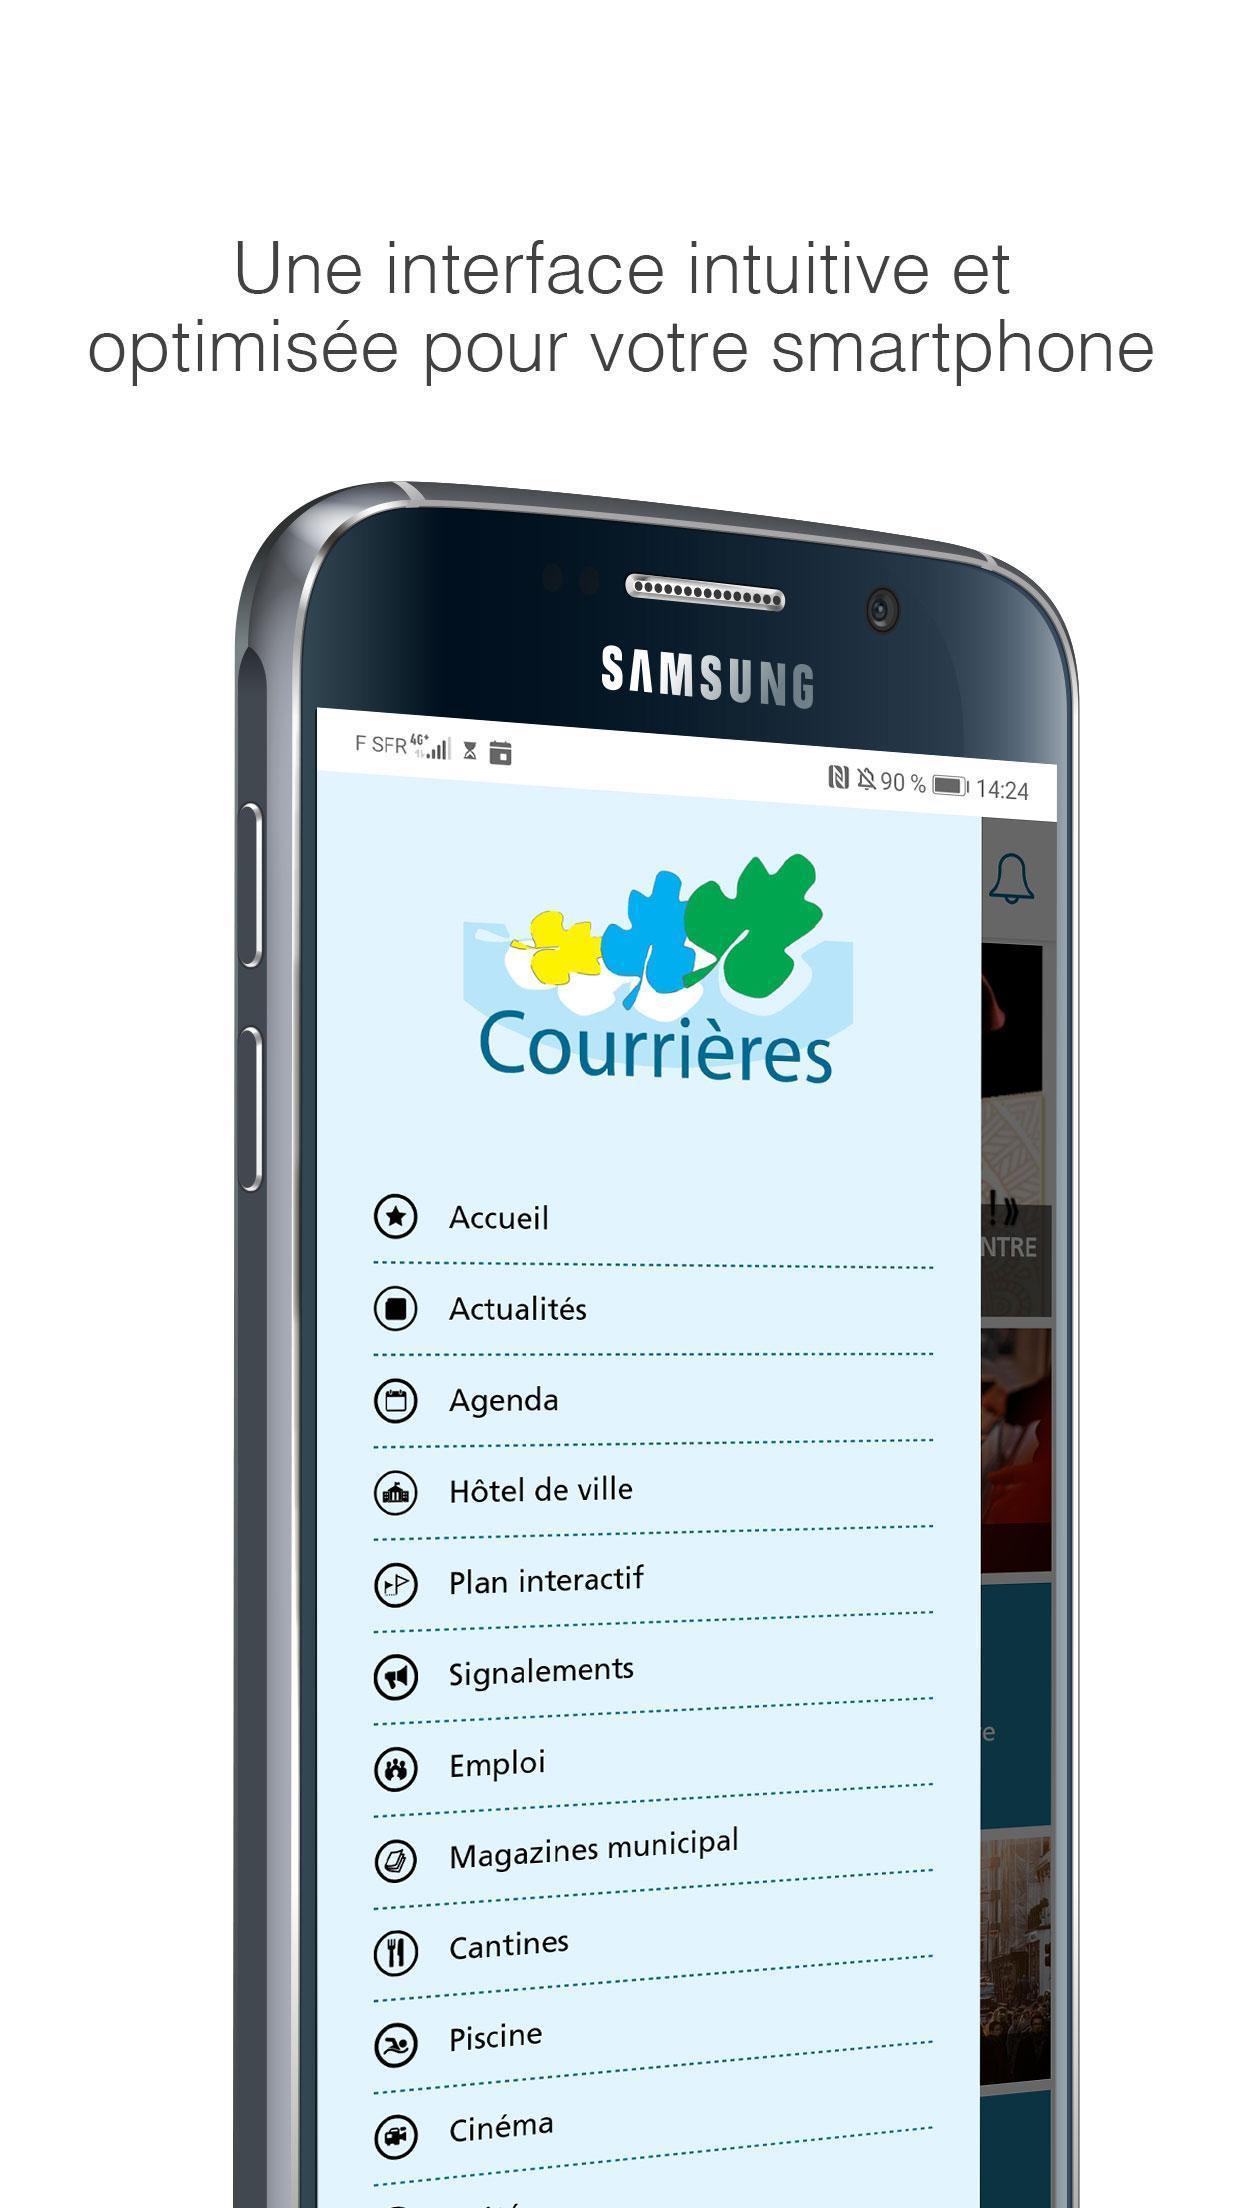 Android Için Courrières - Apk'yı İndir concernant Piscine De Courrieres